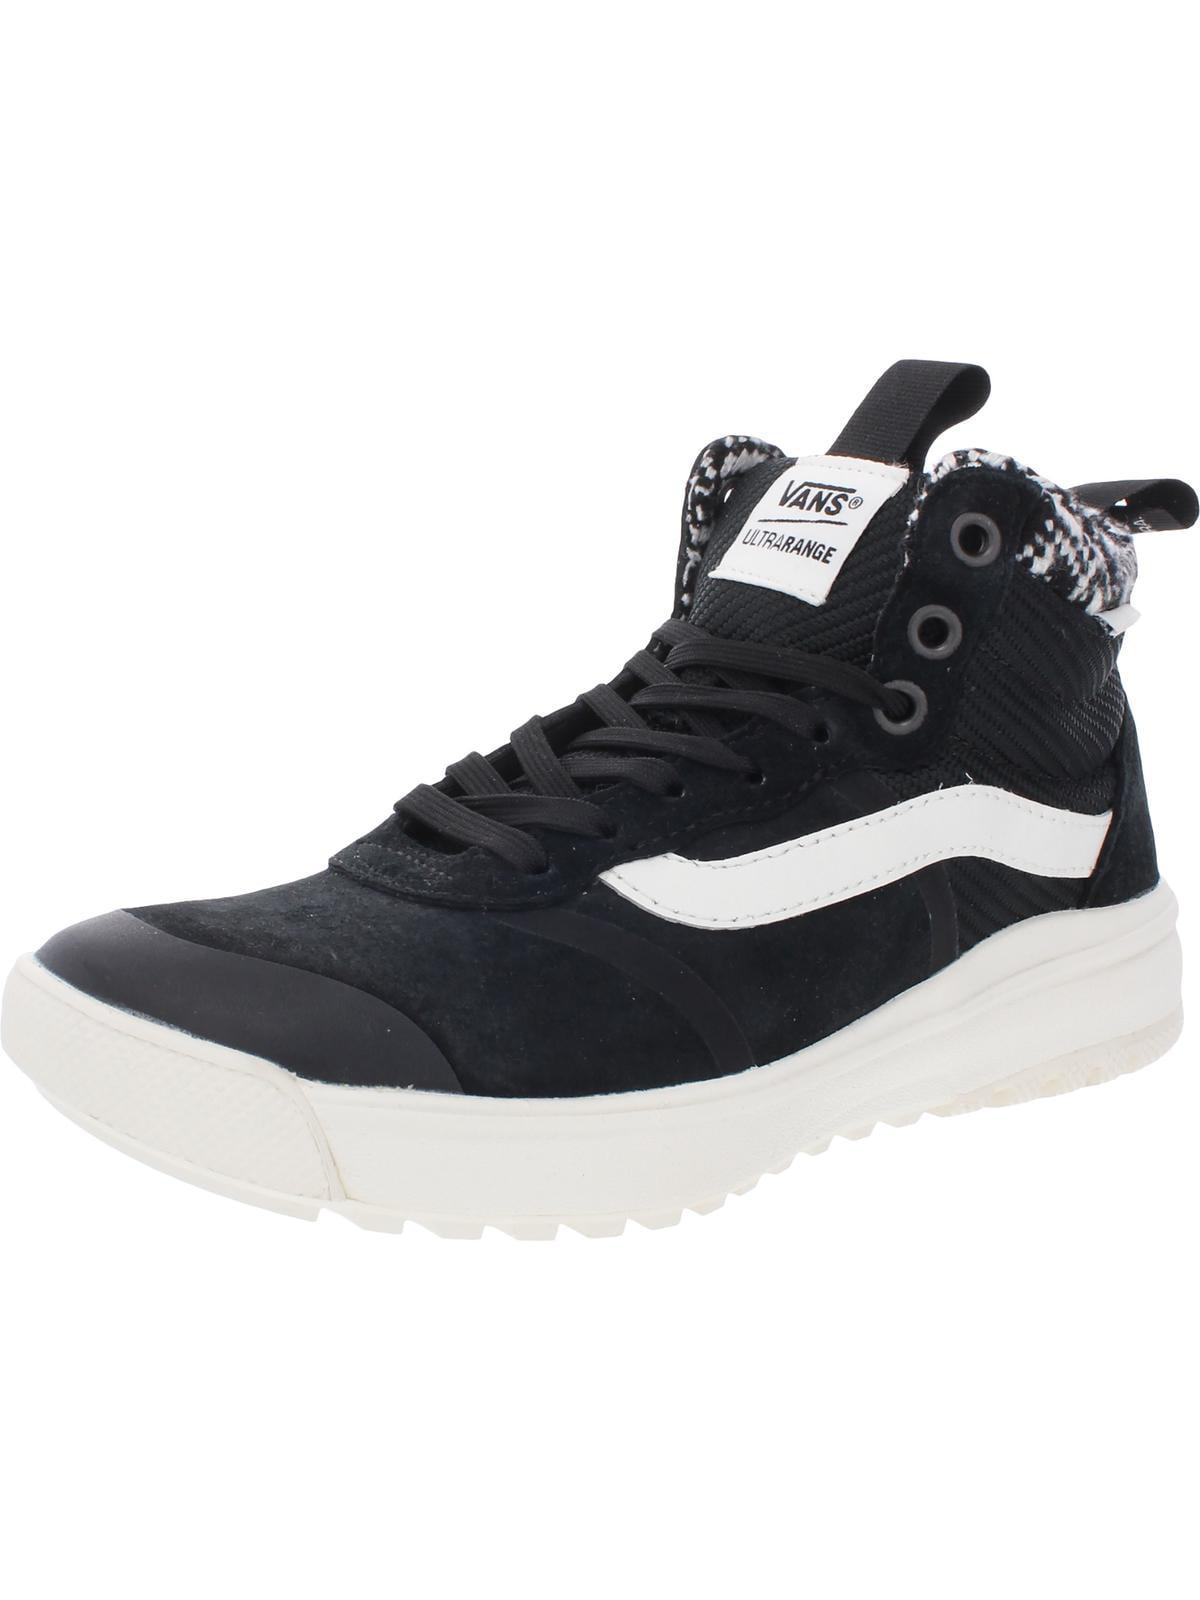 Vans - Vans Mens Ultrarange Hi DI Suede Woven Skate Shoes Black ...